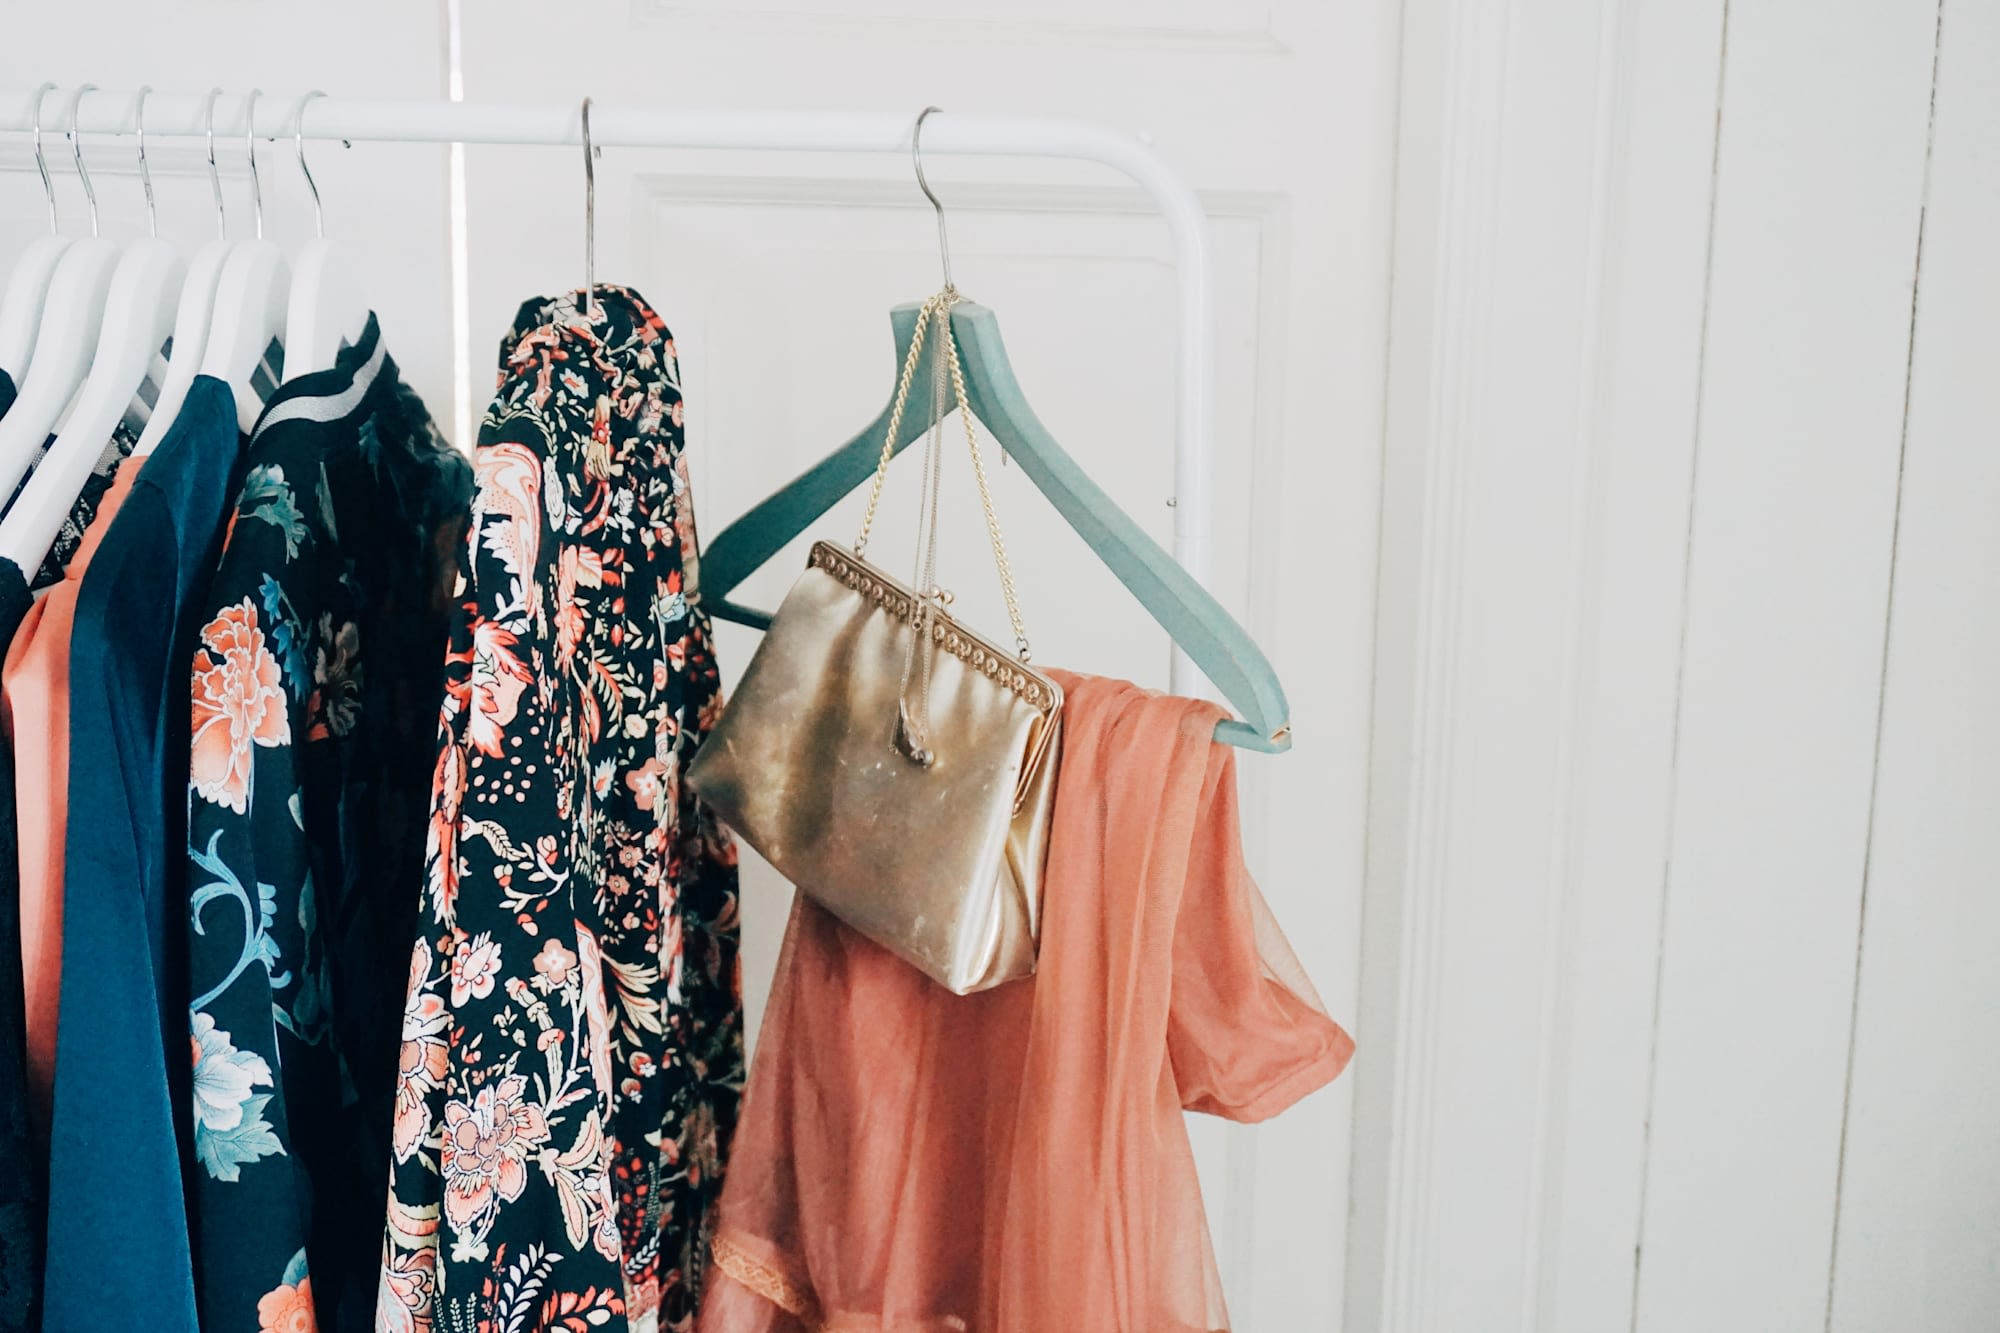 Clothing resale site Poshmark suffers data breach